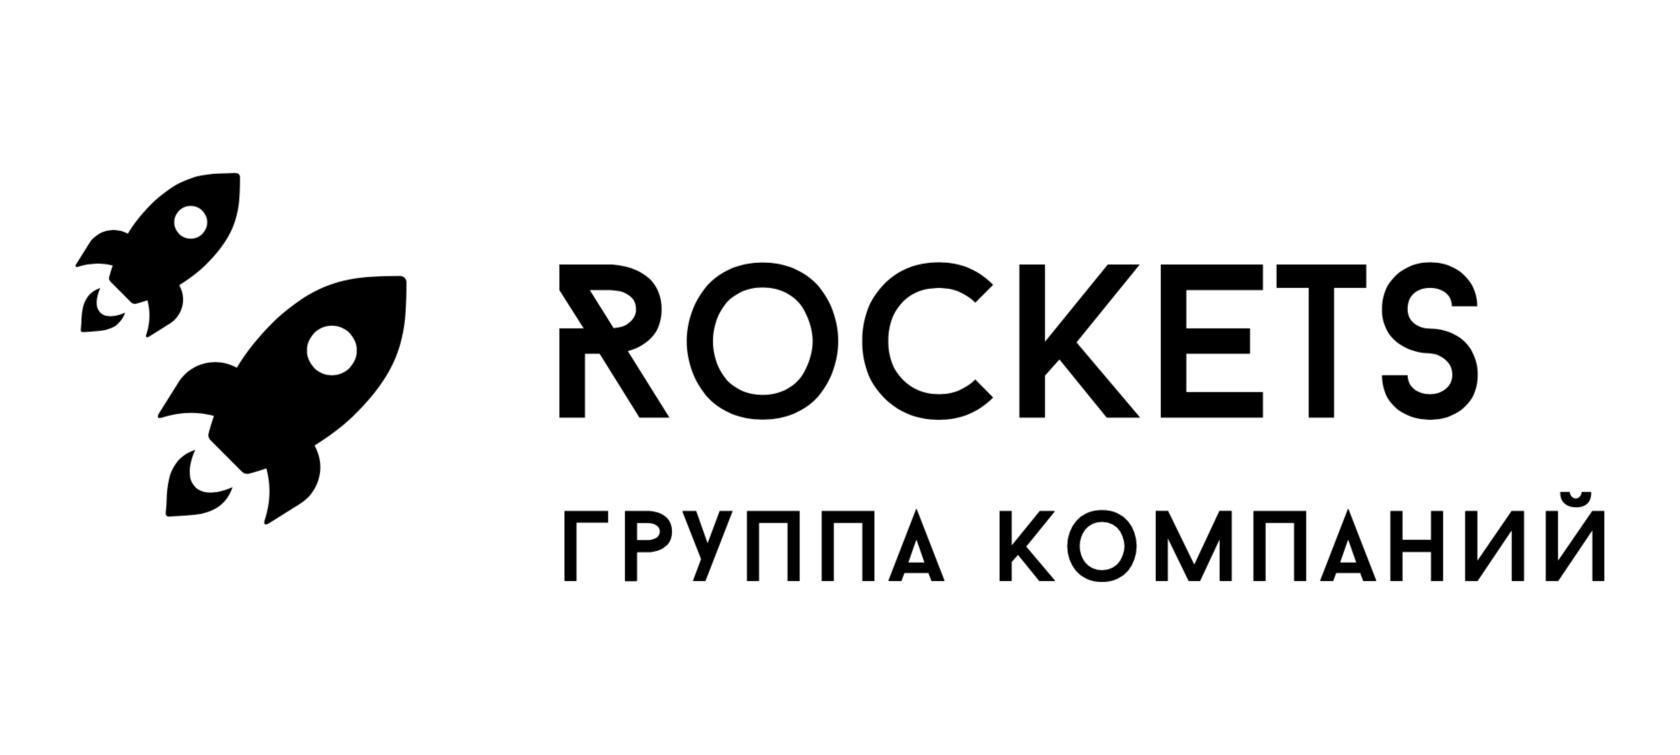 Rockets Group